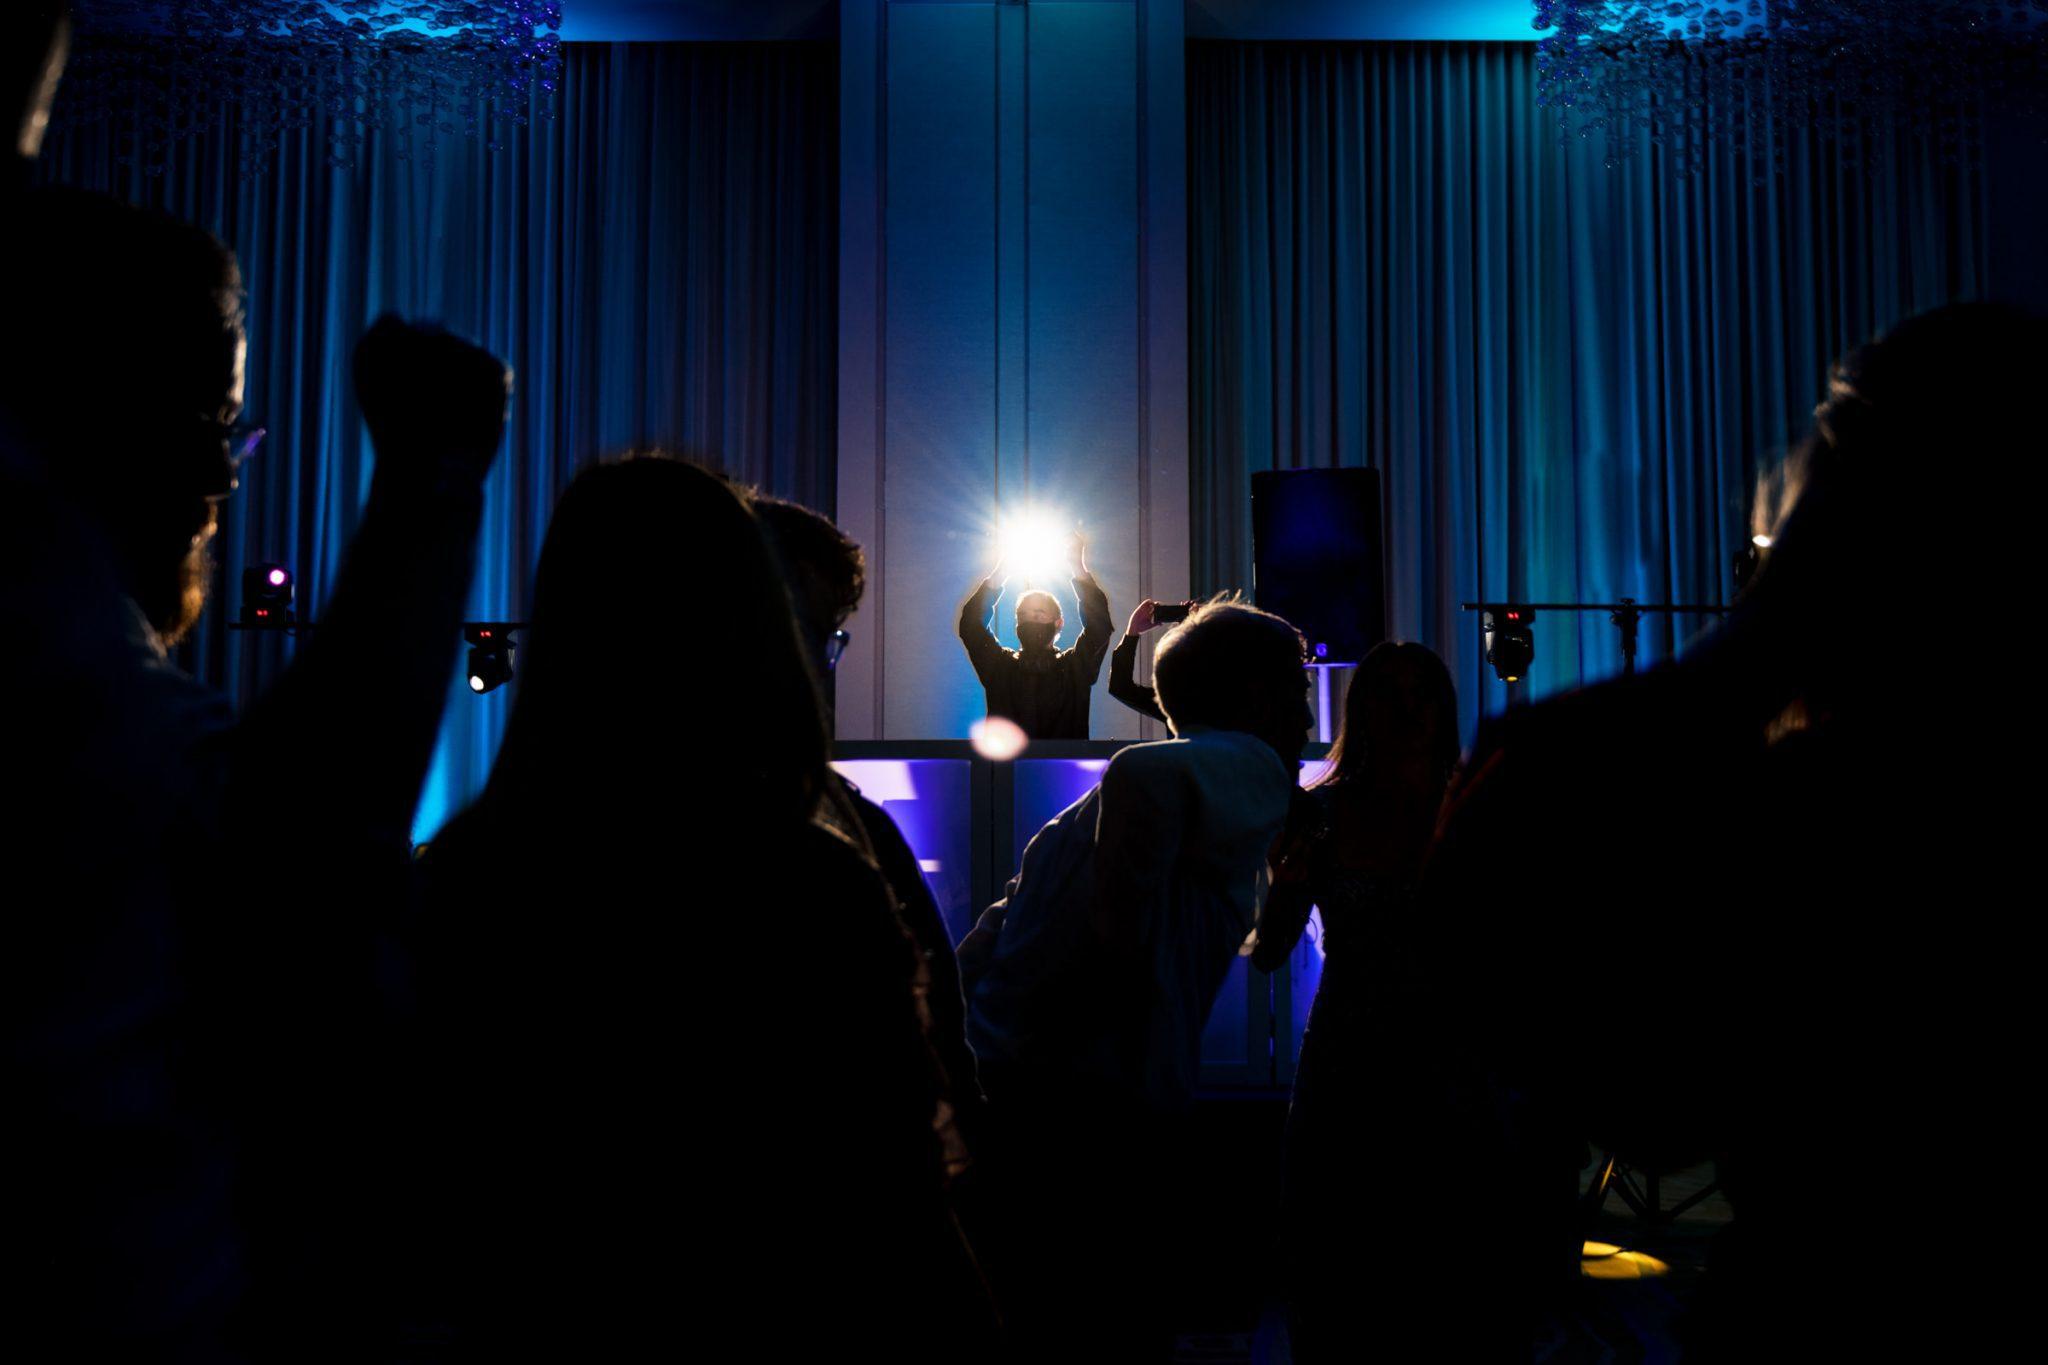 wedding reception and guest dancing at playa largo resort